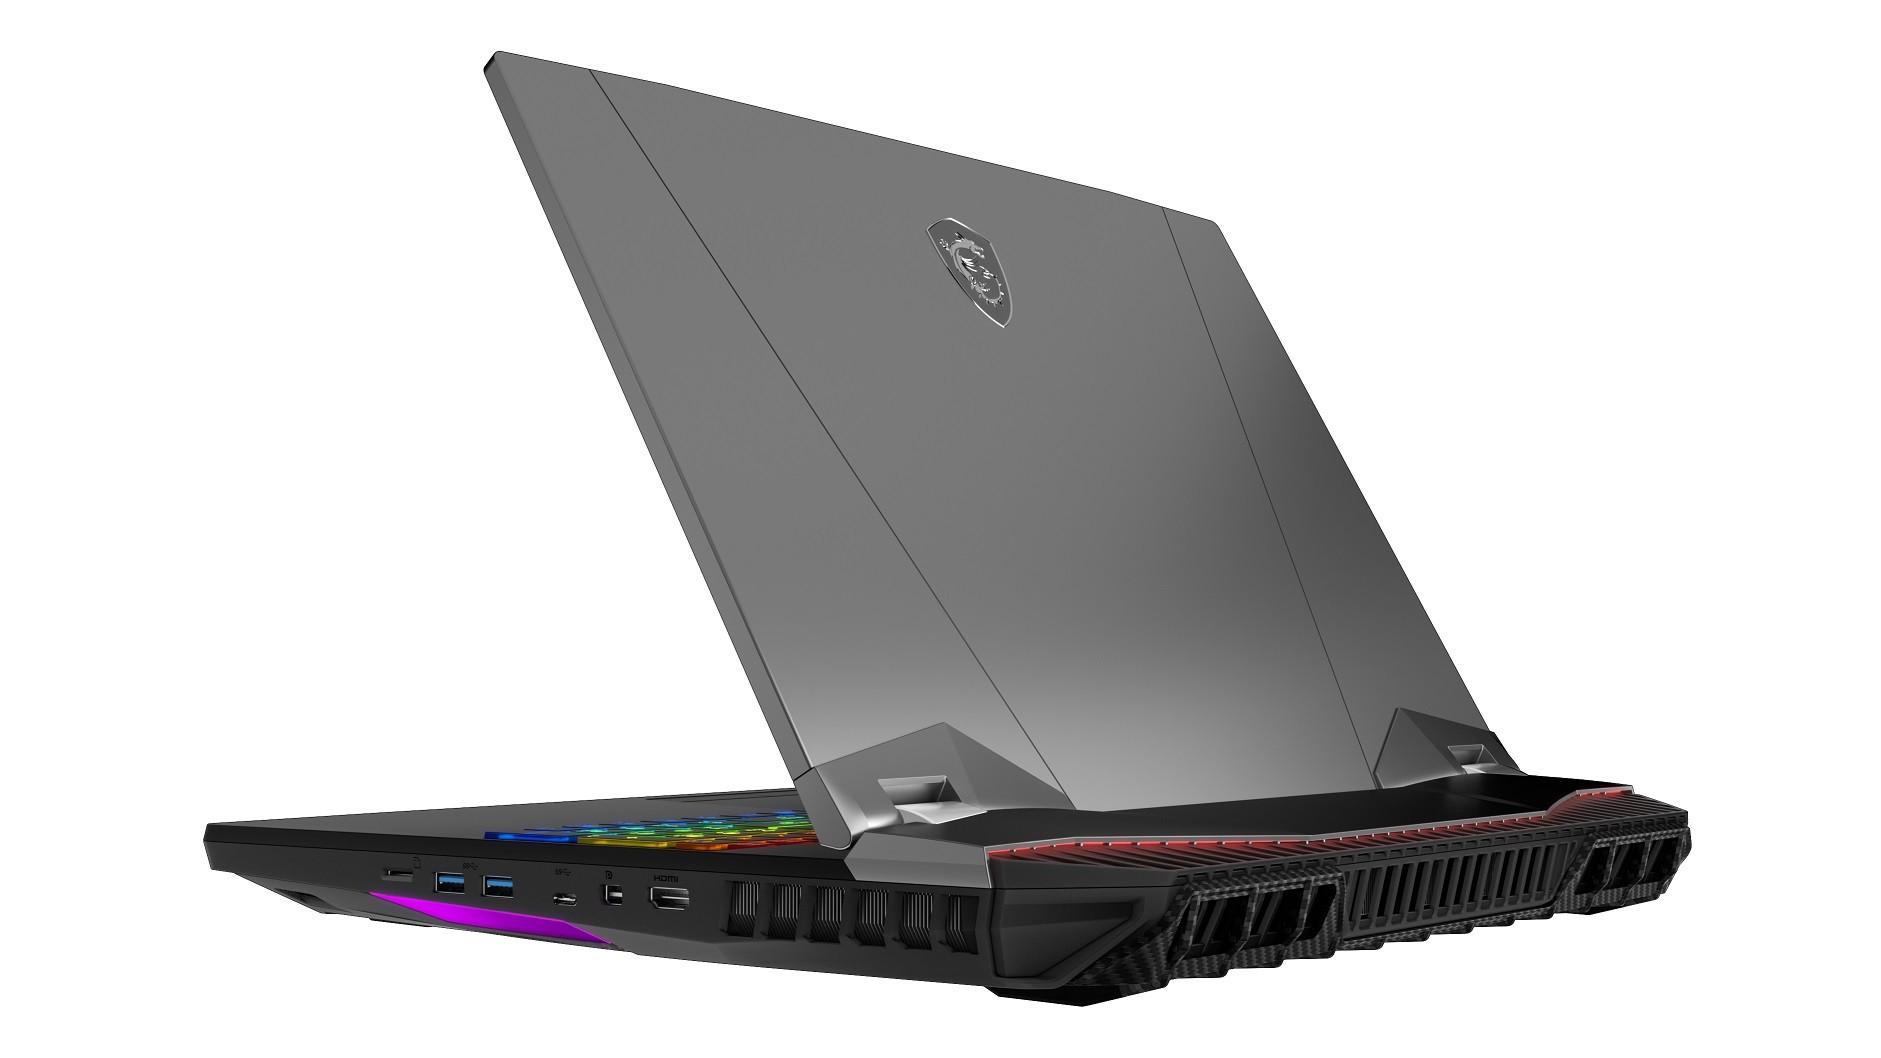 MSI's new GT76 Titan laptop has a 5GHz desktop Core i9